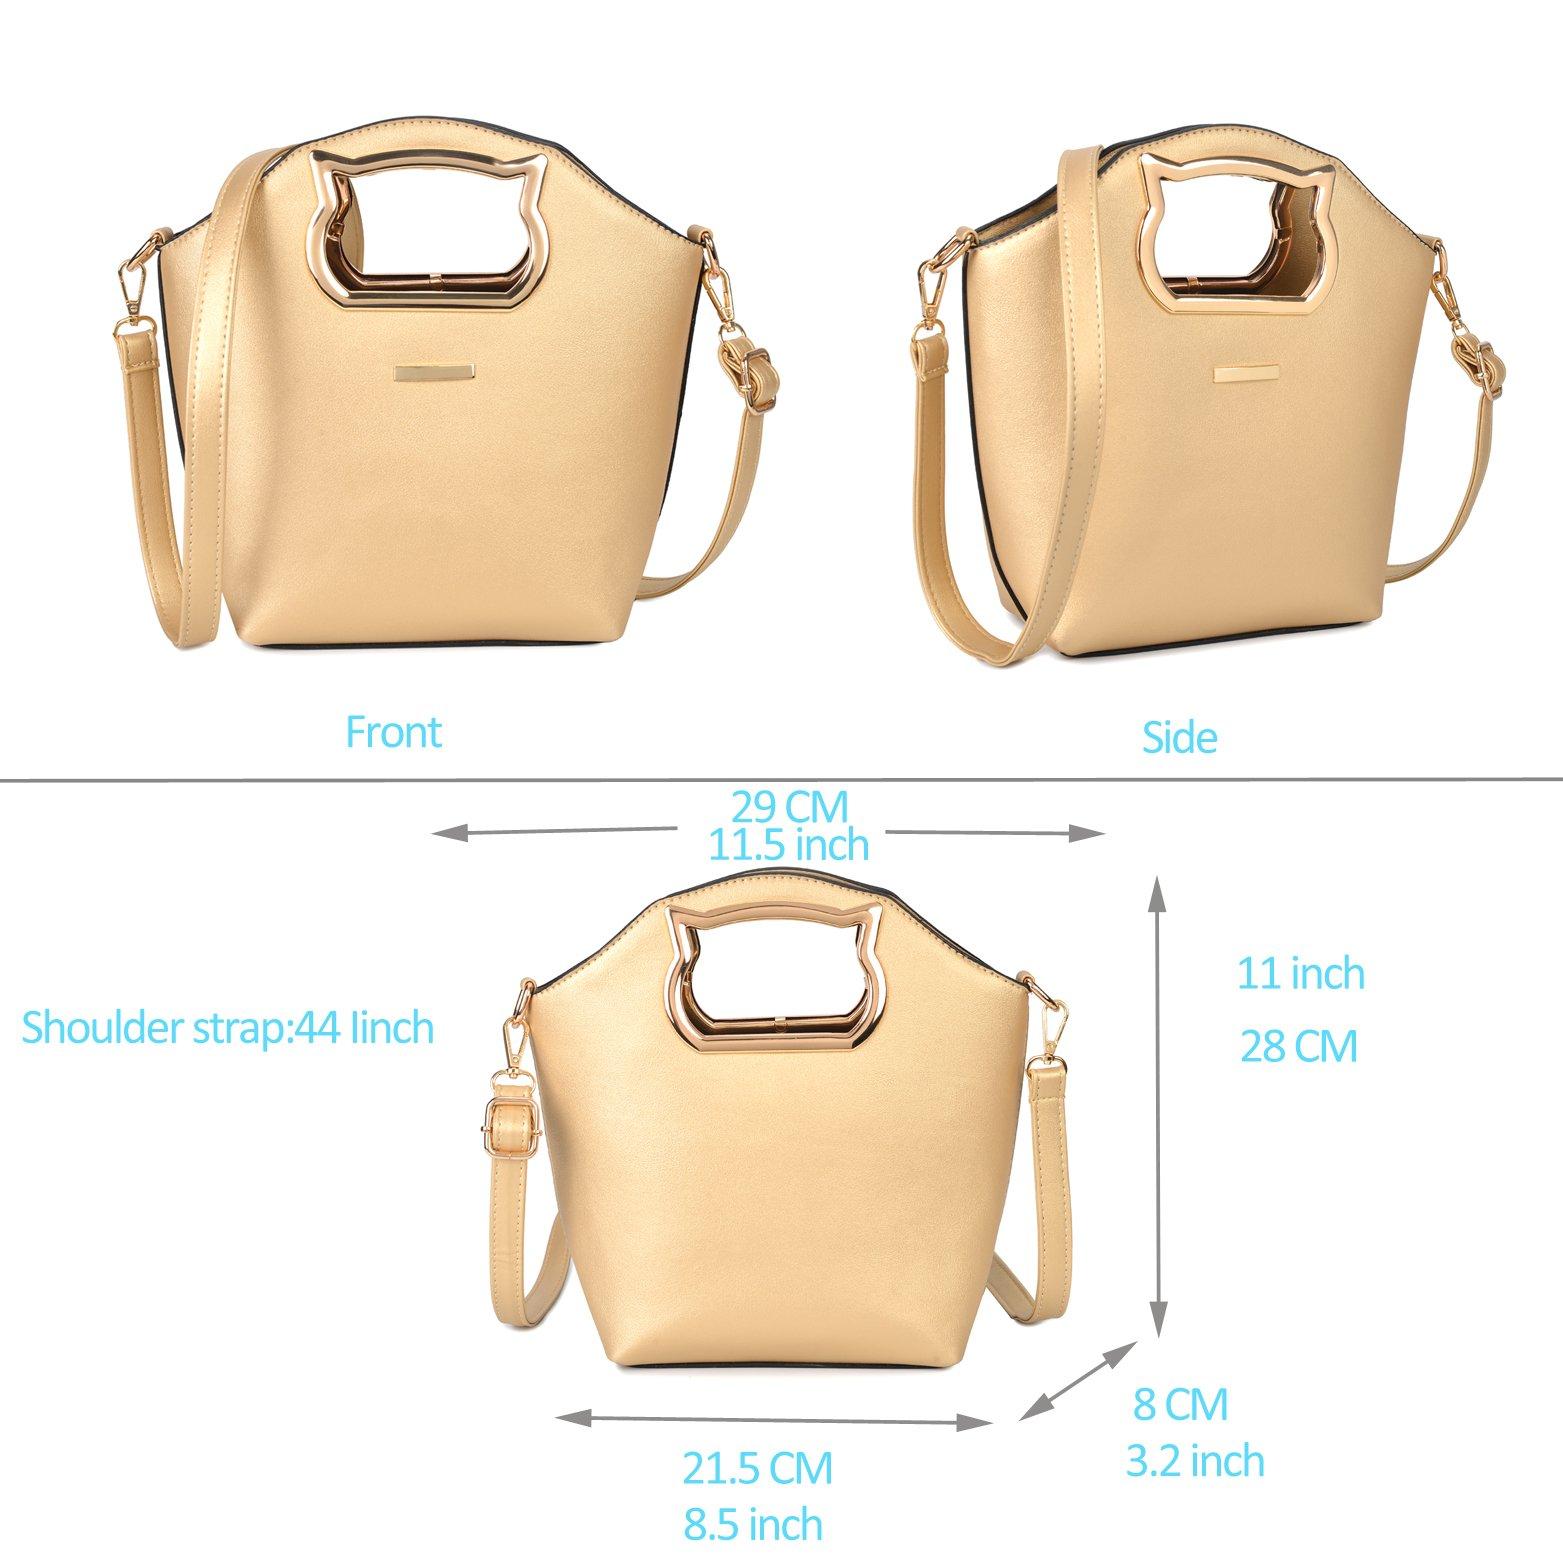 Women Handbag Purse Hobo Faux Leather Messenger Bag Clutch Satchel Bag 3 Piece Gift Set by KasPala (Image #6)